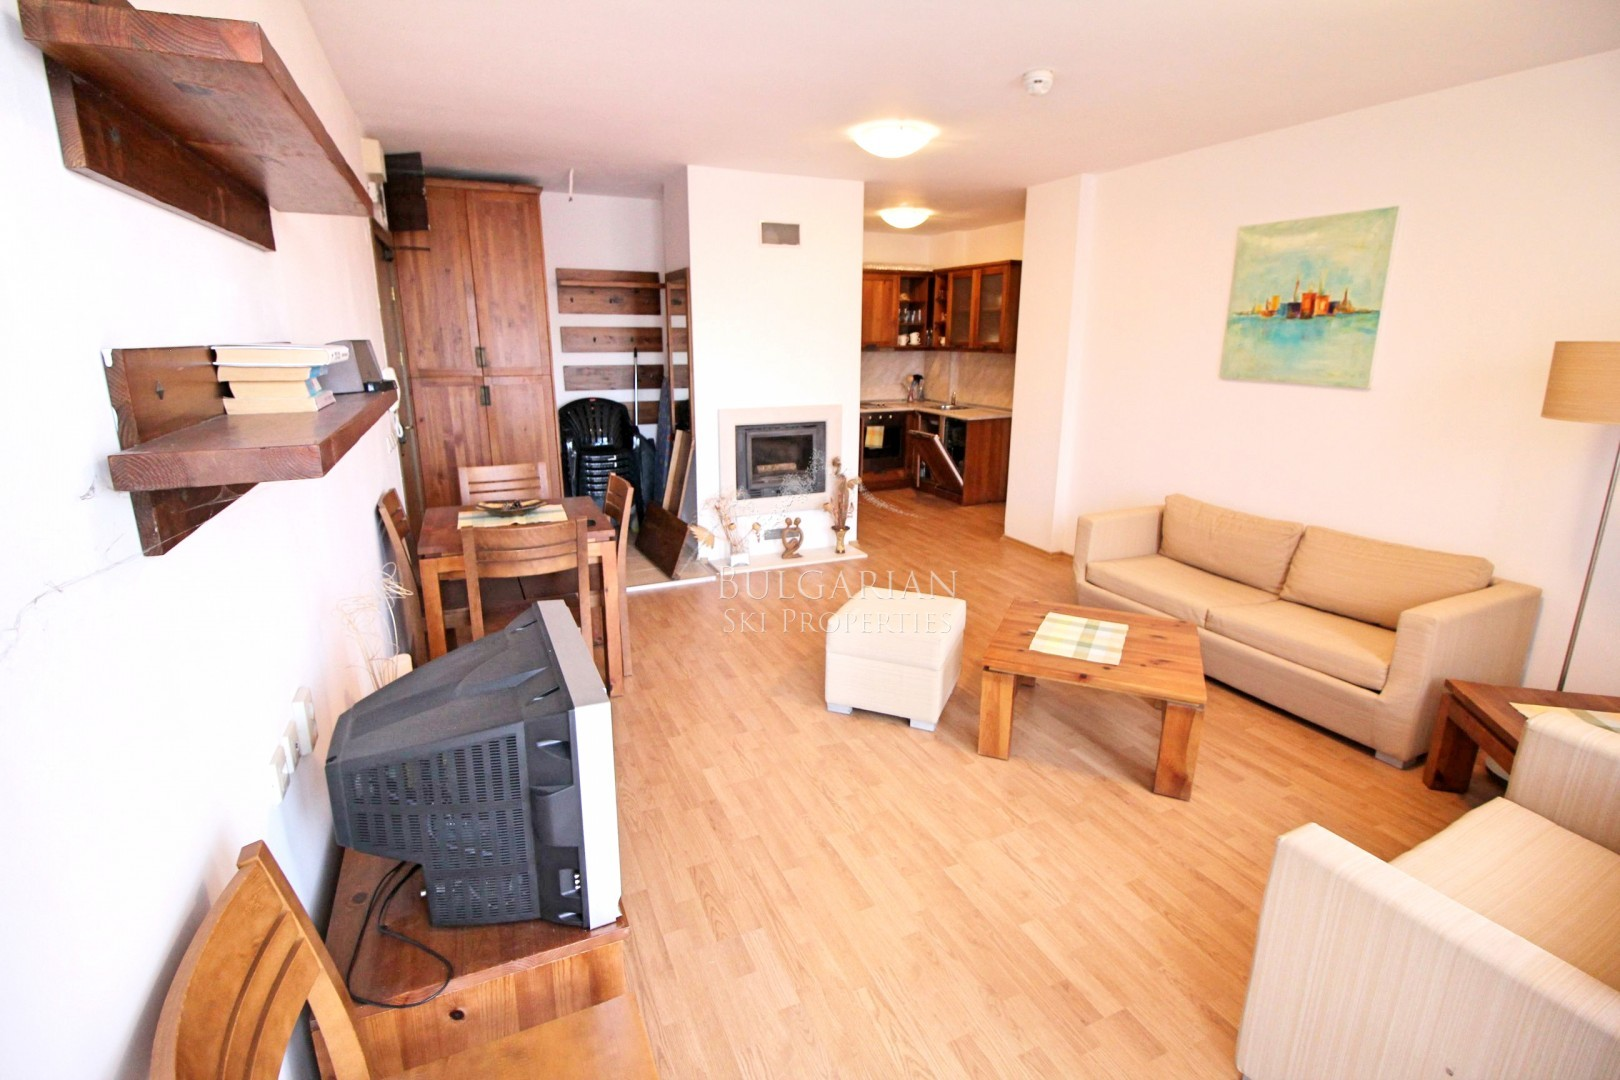 Сейнт Джон Хил, Банско: просторен двустаен апартамент за продажба